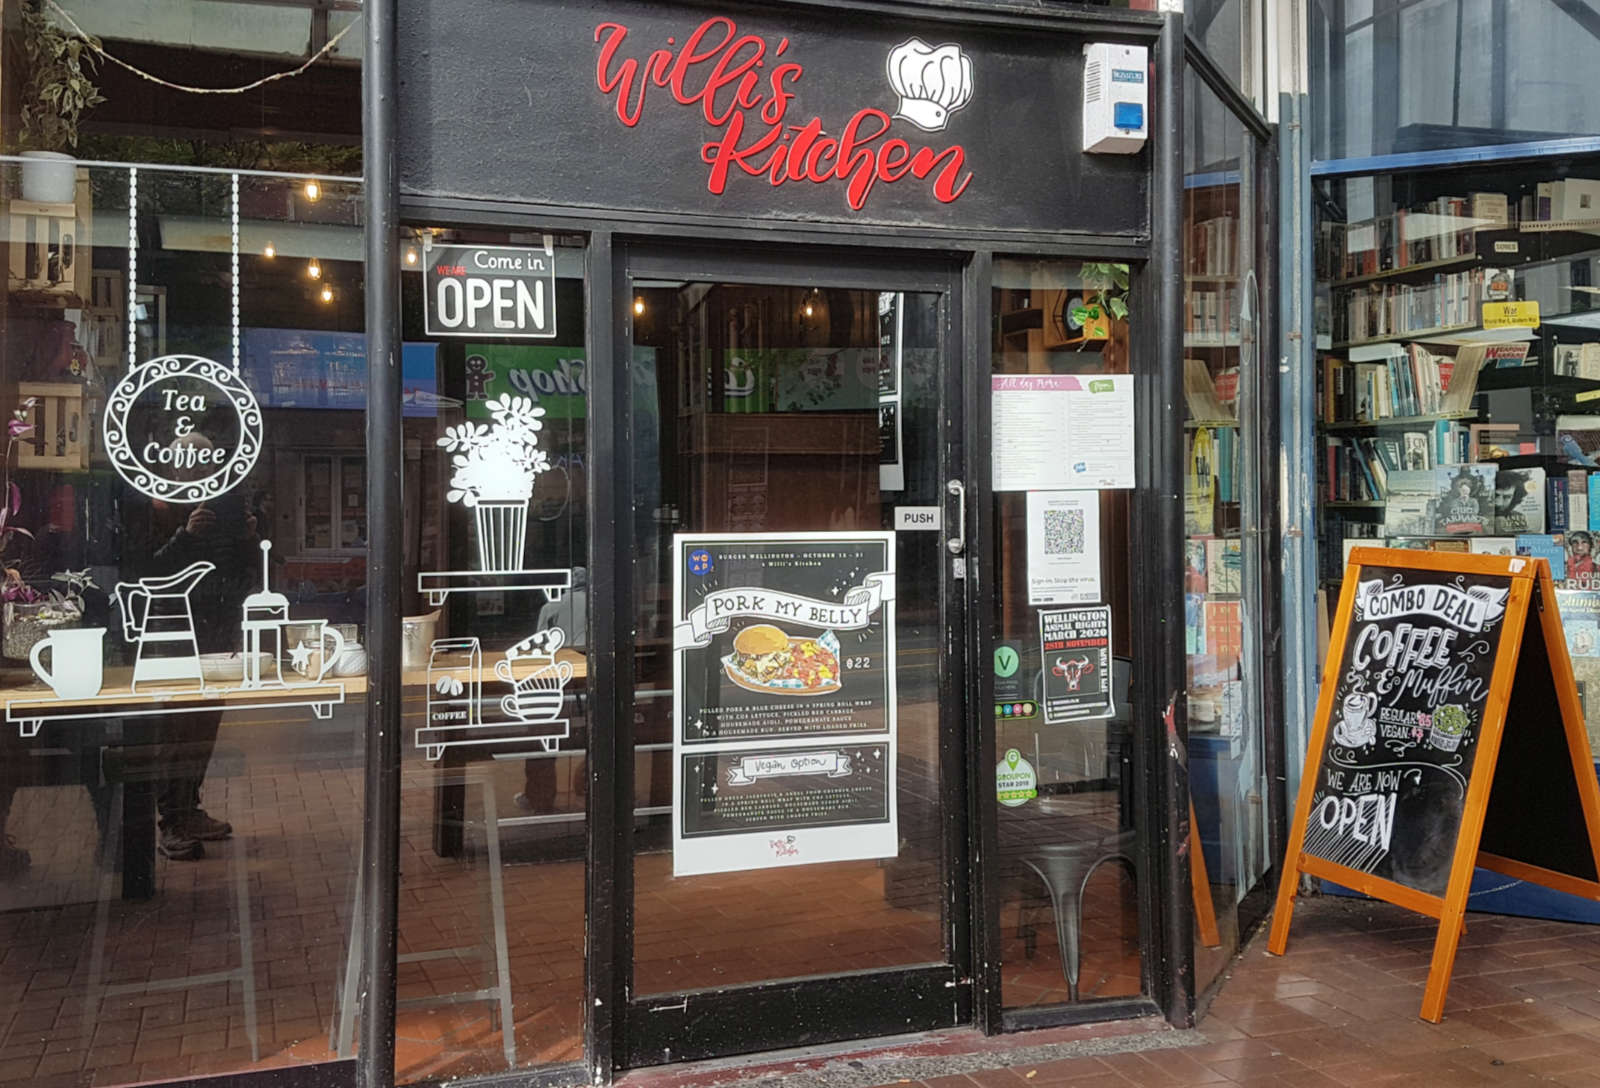 Willi's Kitchen - exterior